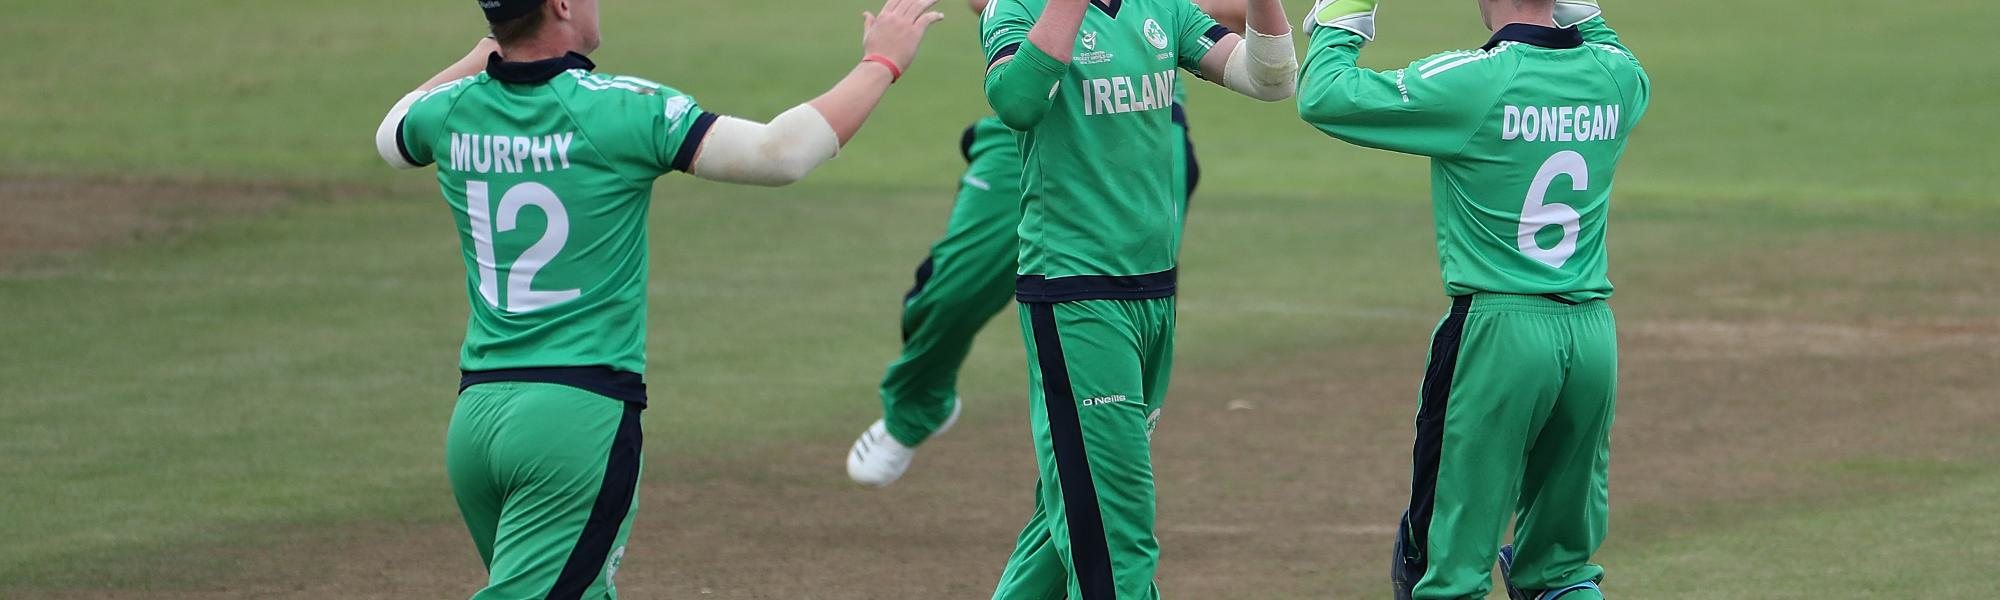 Ireland U19 celebrate